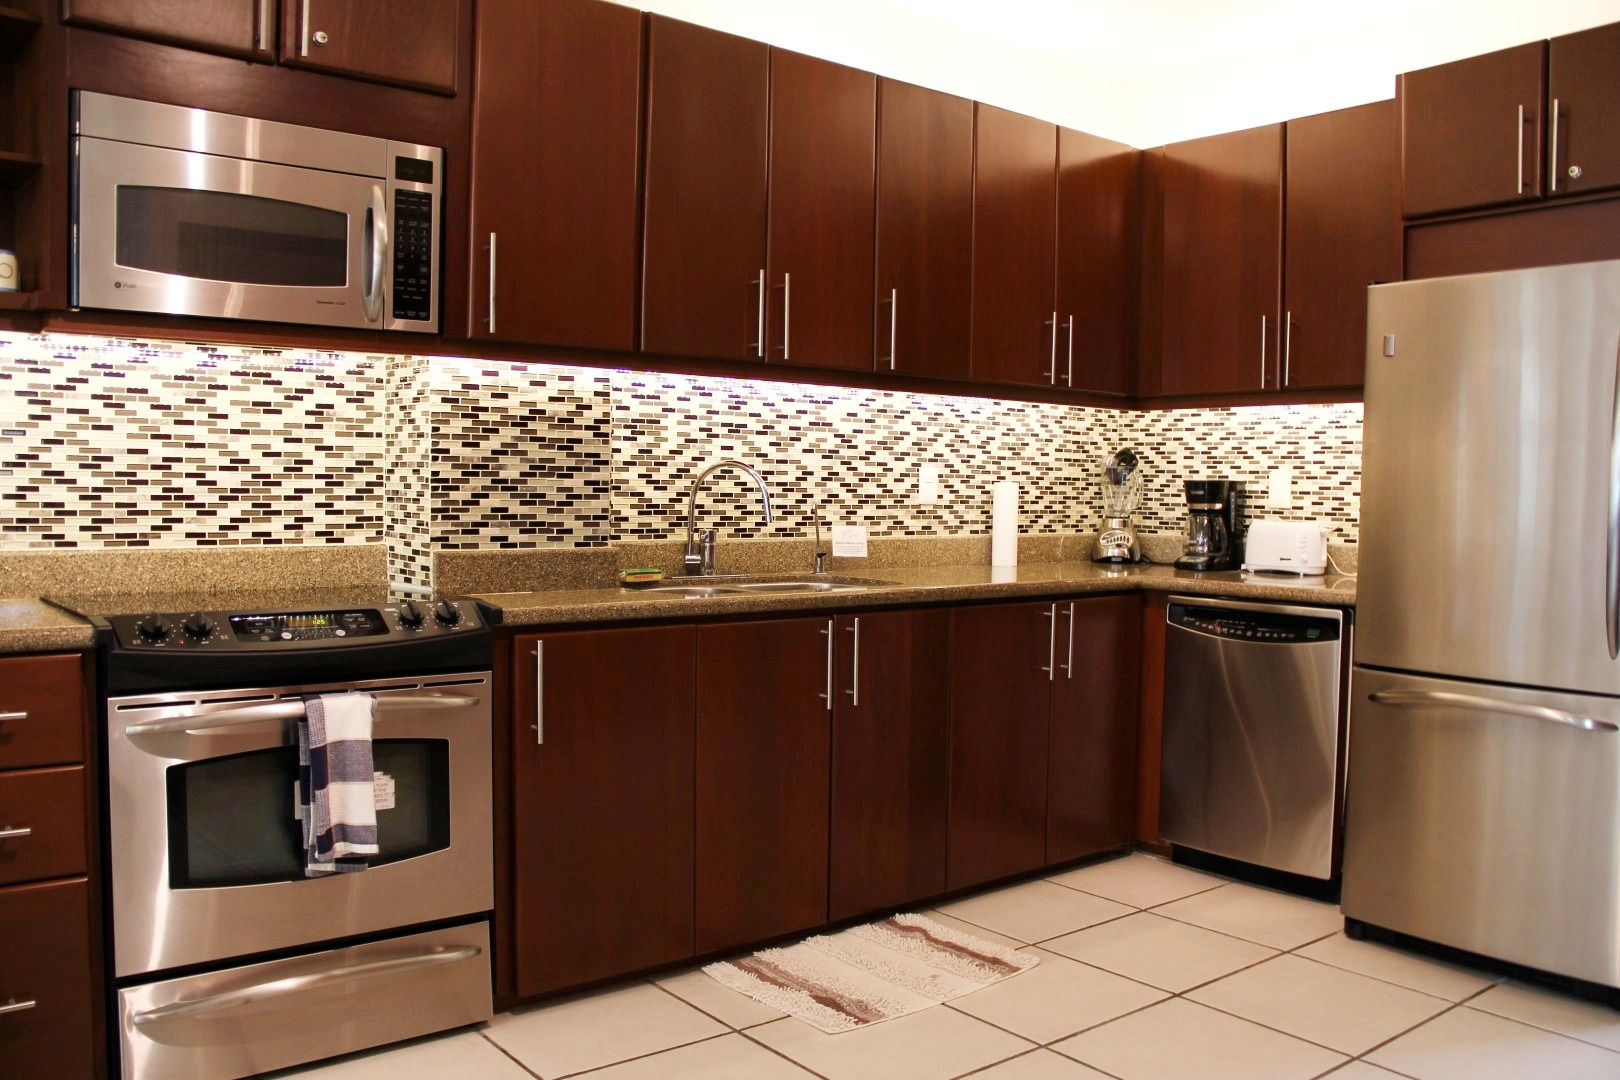 Modern, equipped kitchen.